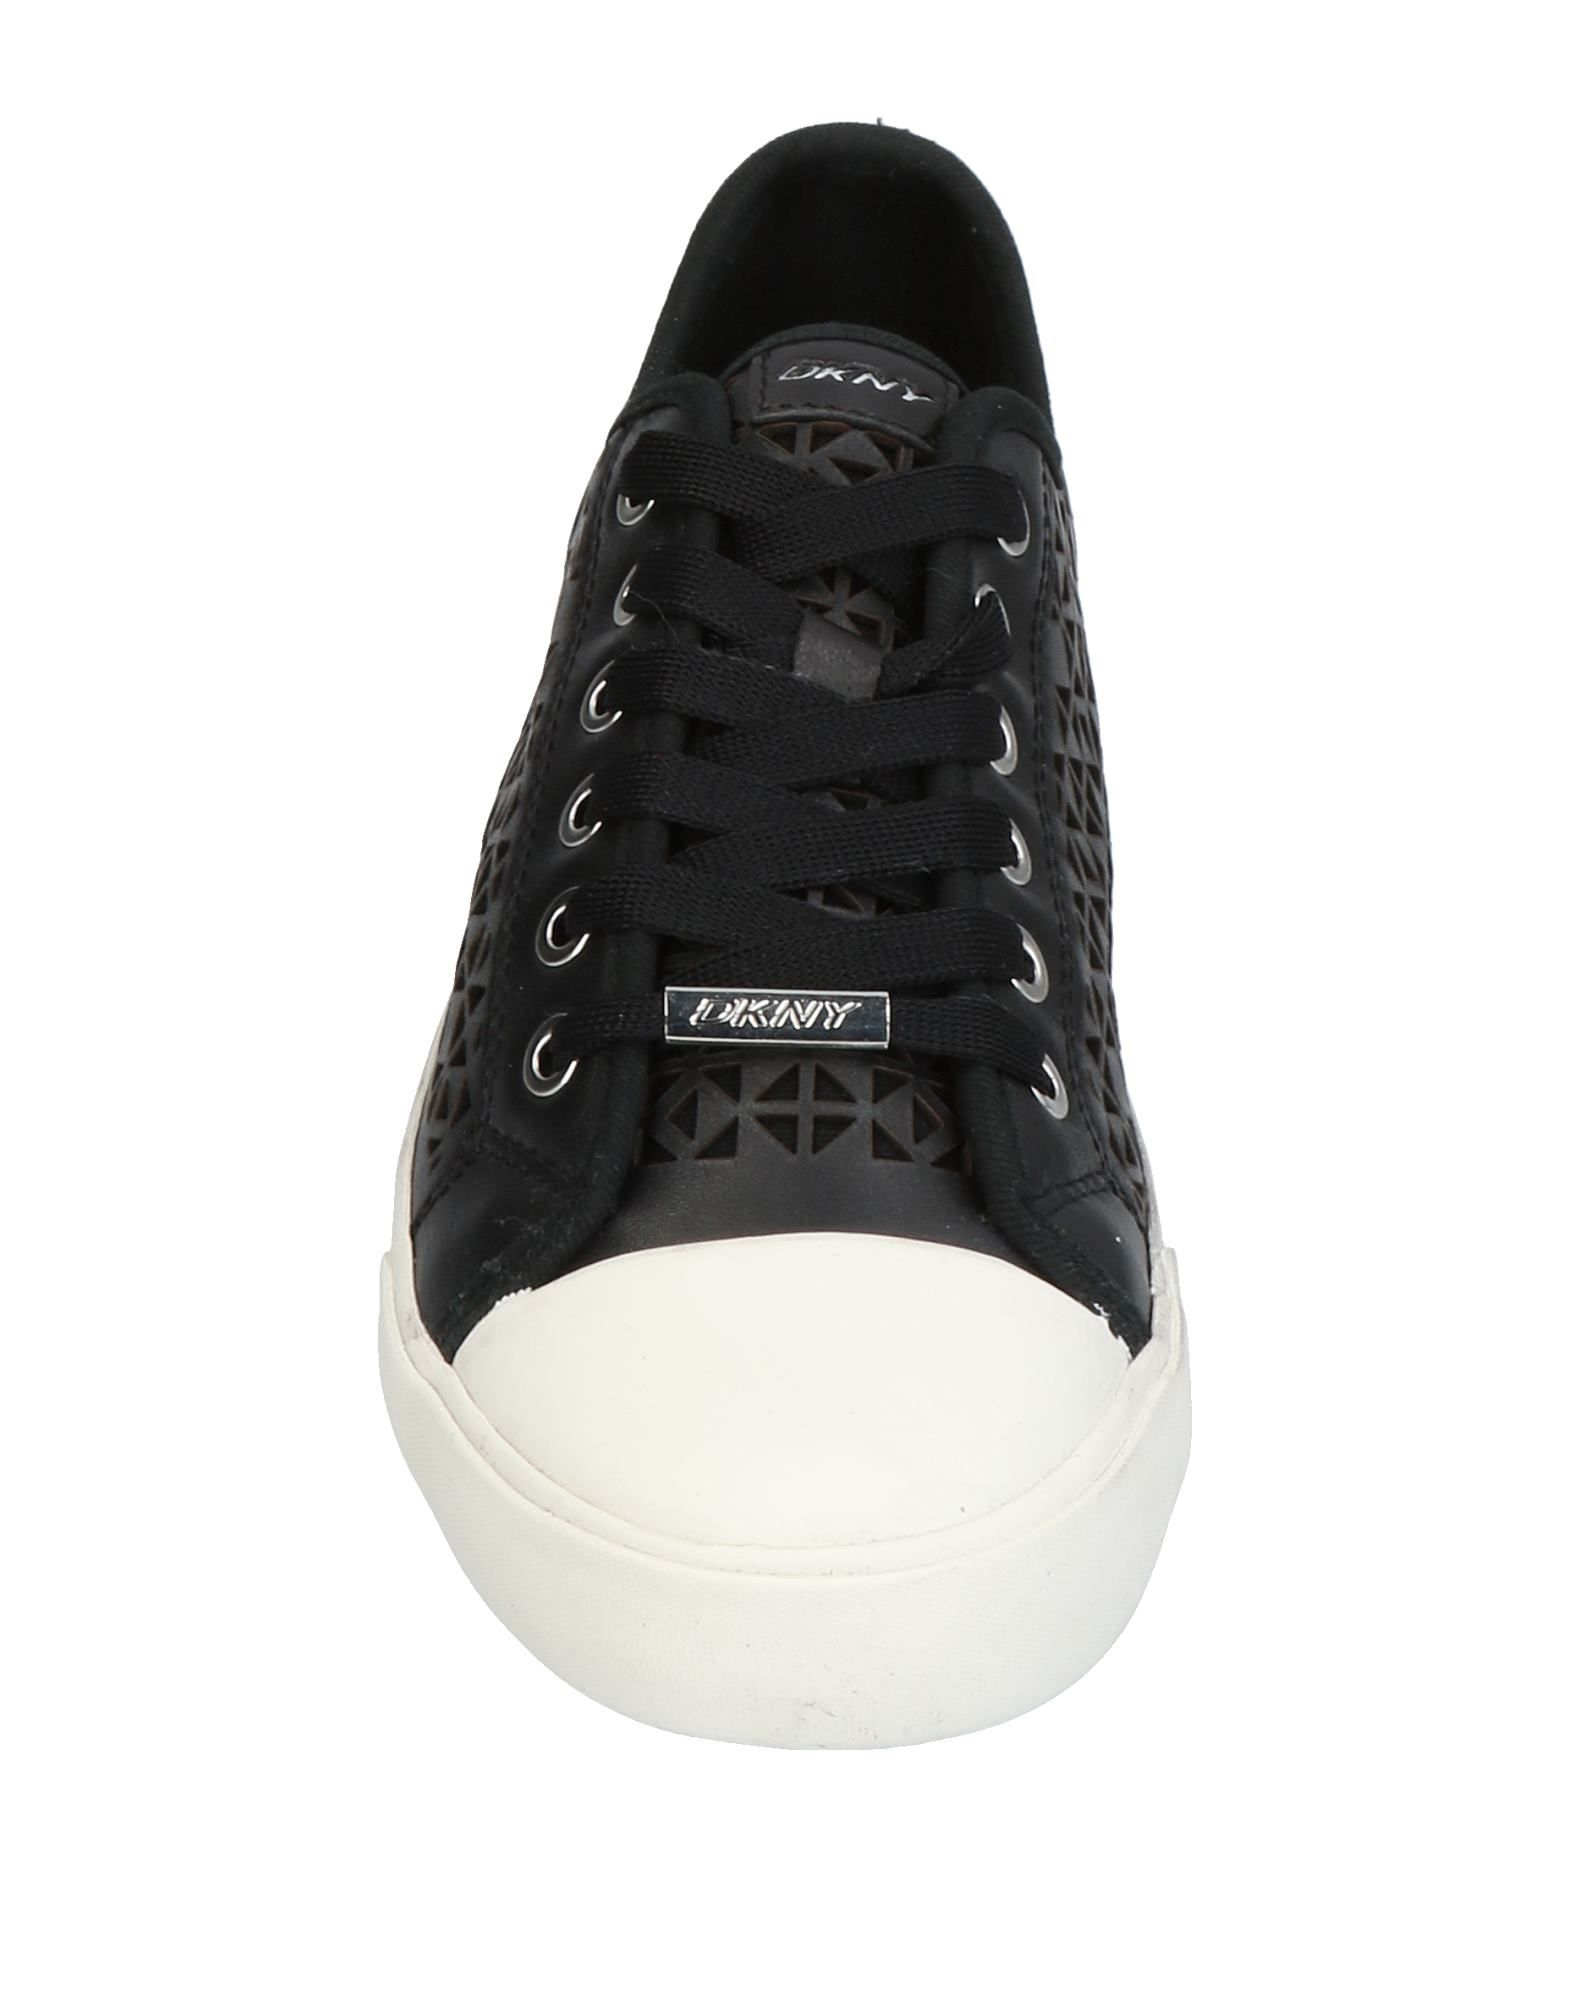 Sneakers Dkny Femme - Sneakers Dkny sur